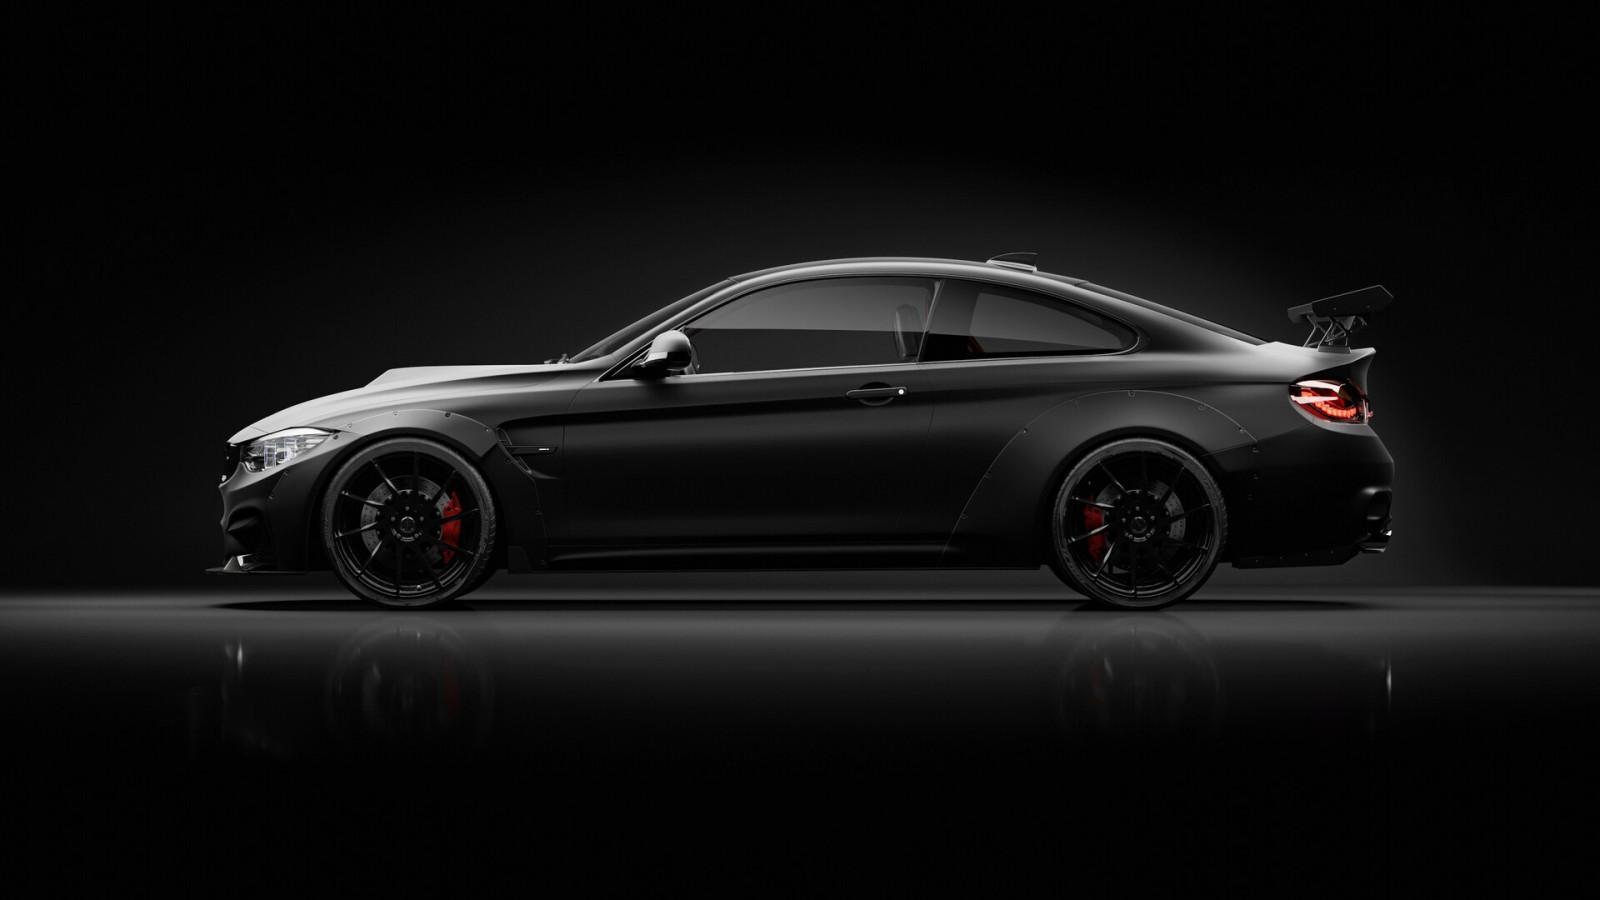 Wallpaper : black cars, BMW, car, vehicle 1920x1080 ...